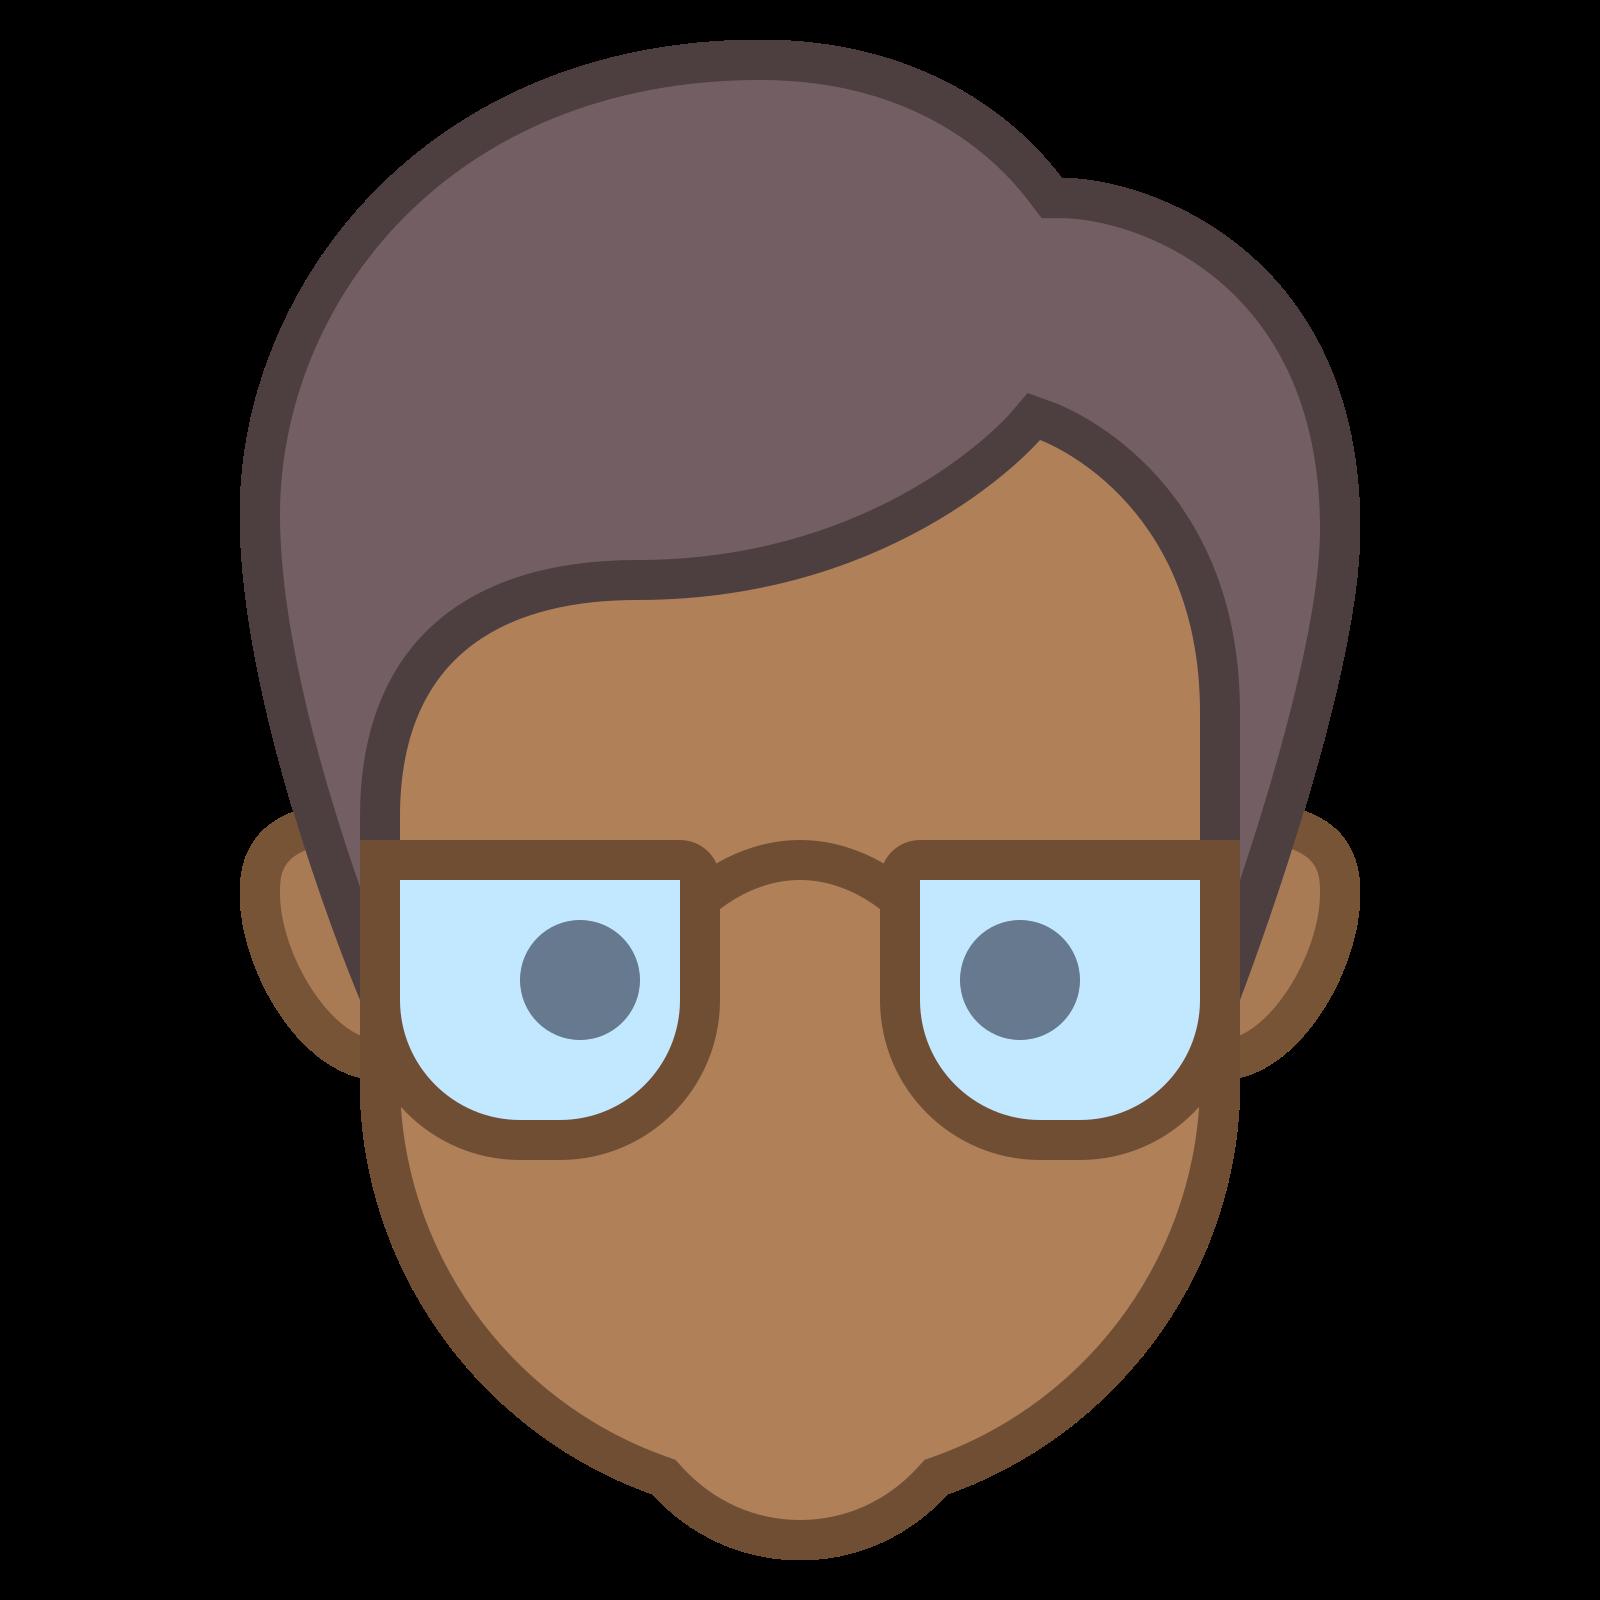 School Director Male Skin Type 6 icon